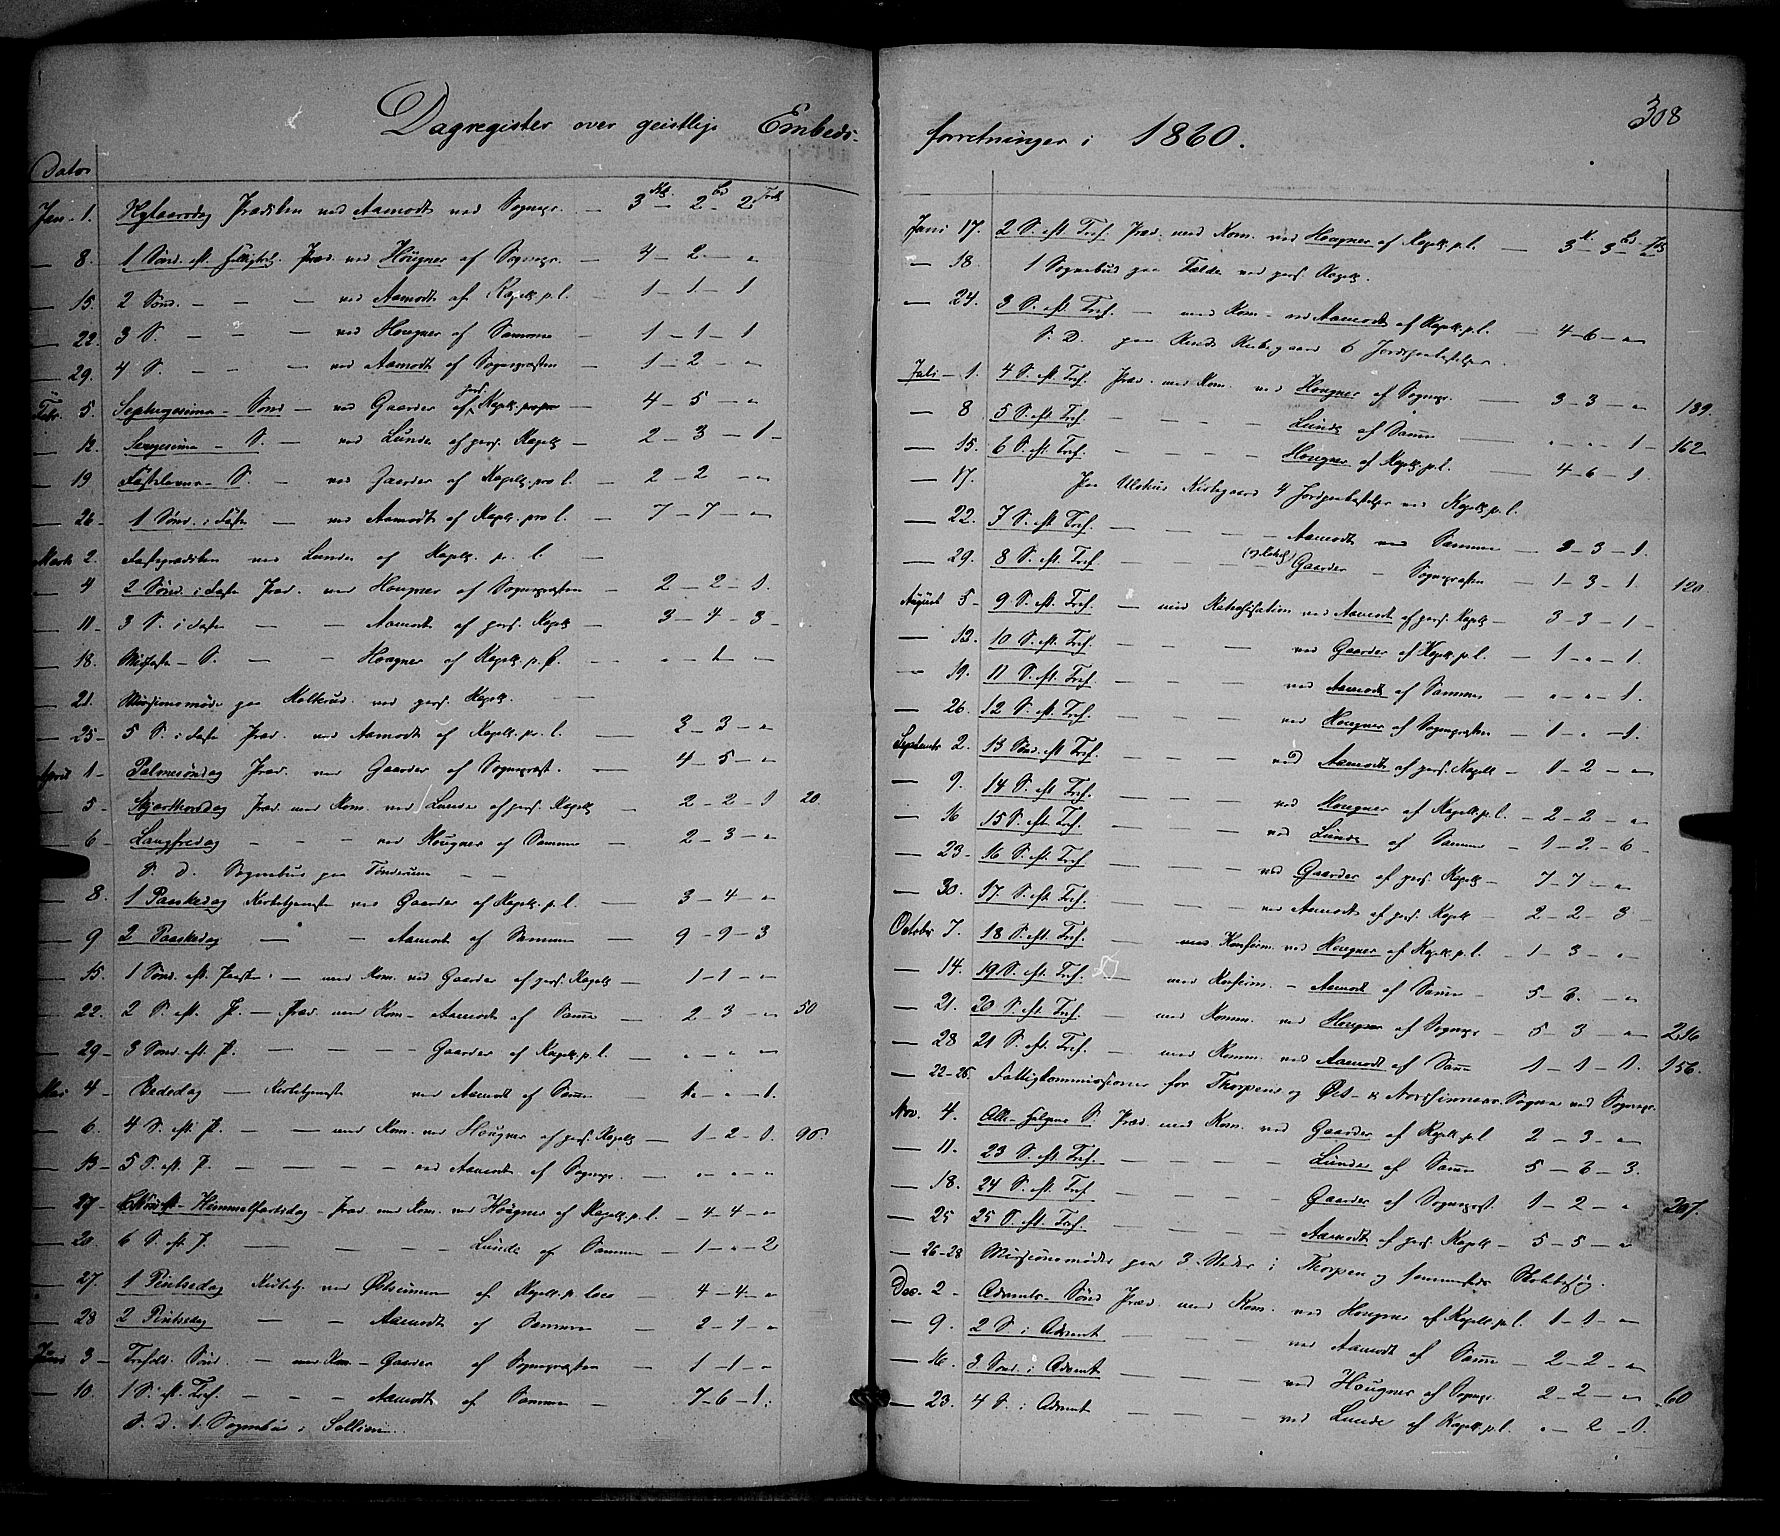 SAH, Nordre Land prestekontor, Ministerialbok nr. 1, 1860-1871, s. 308